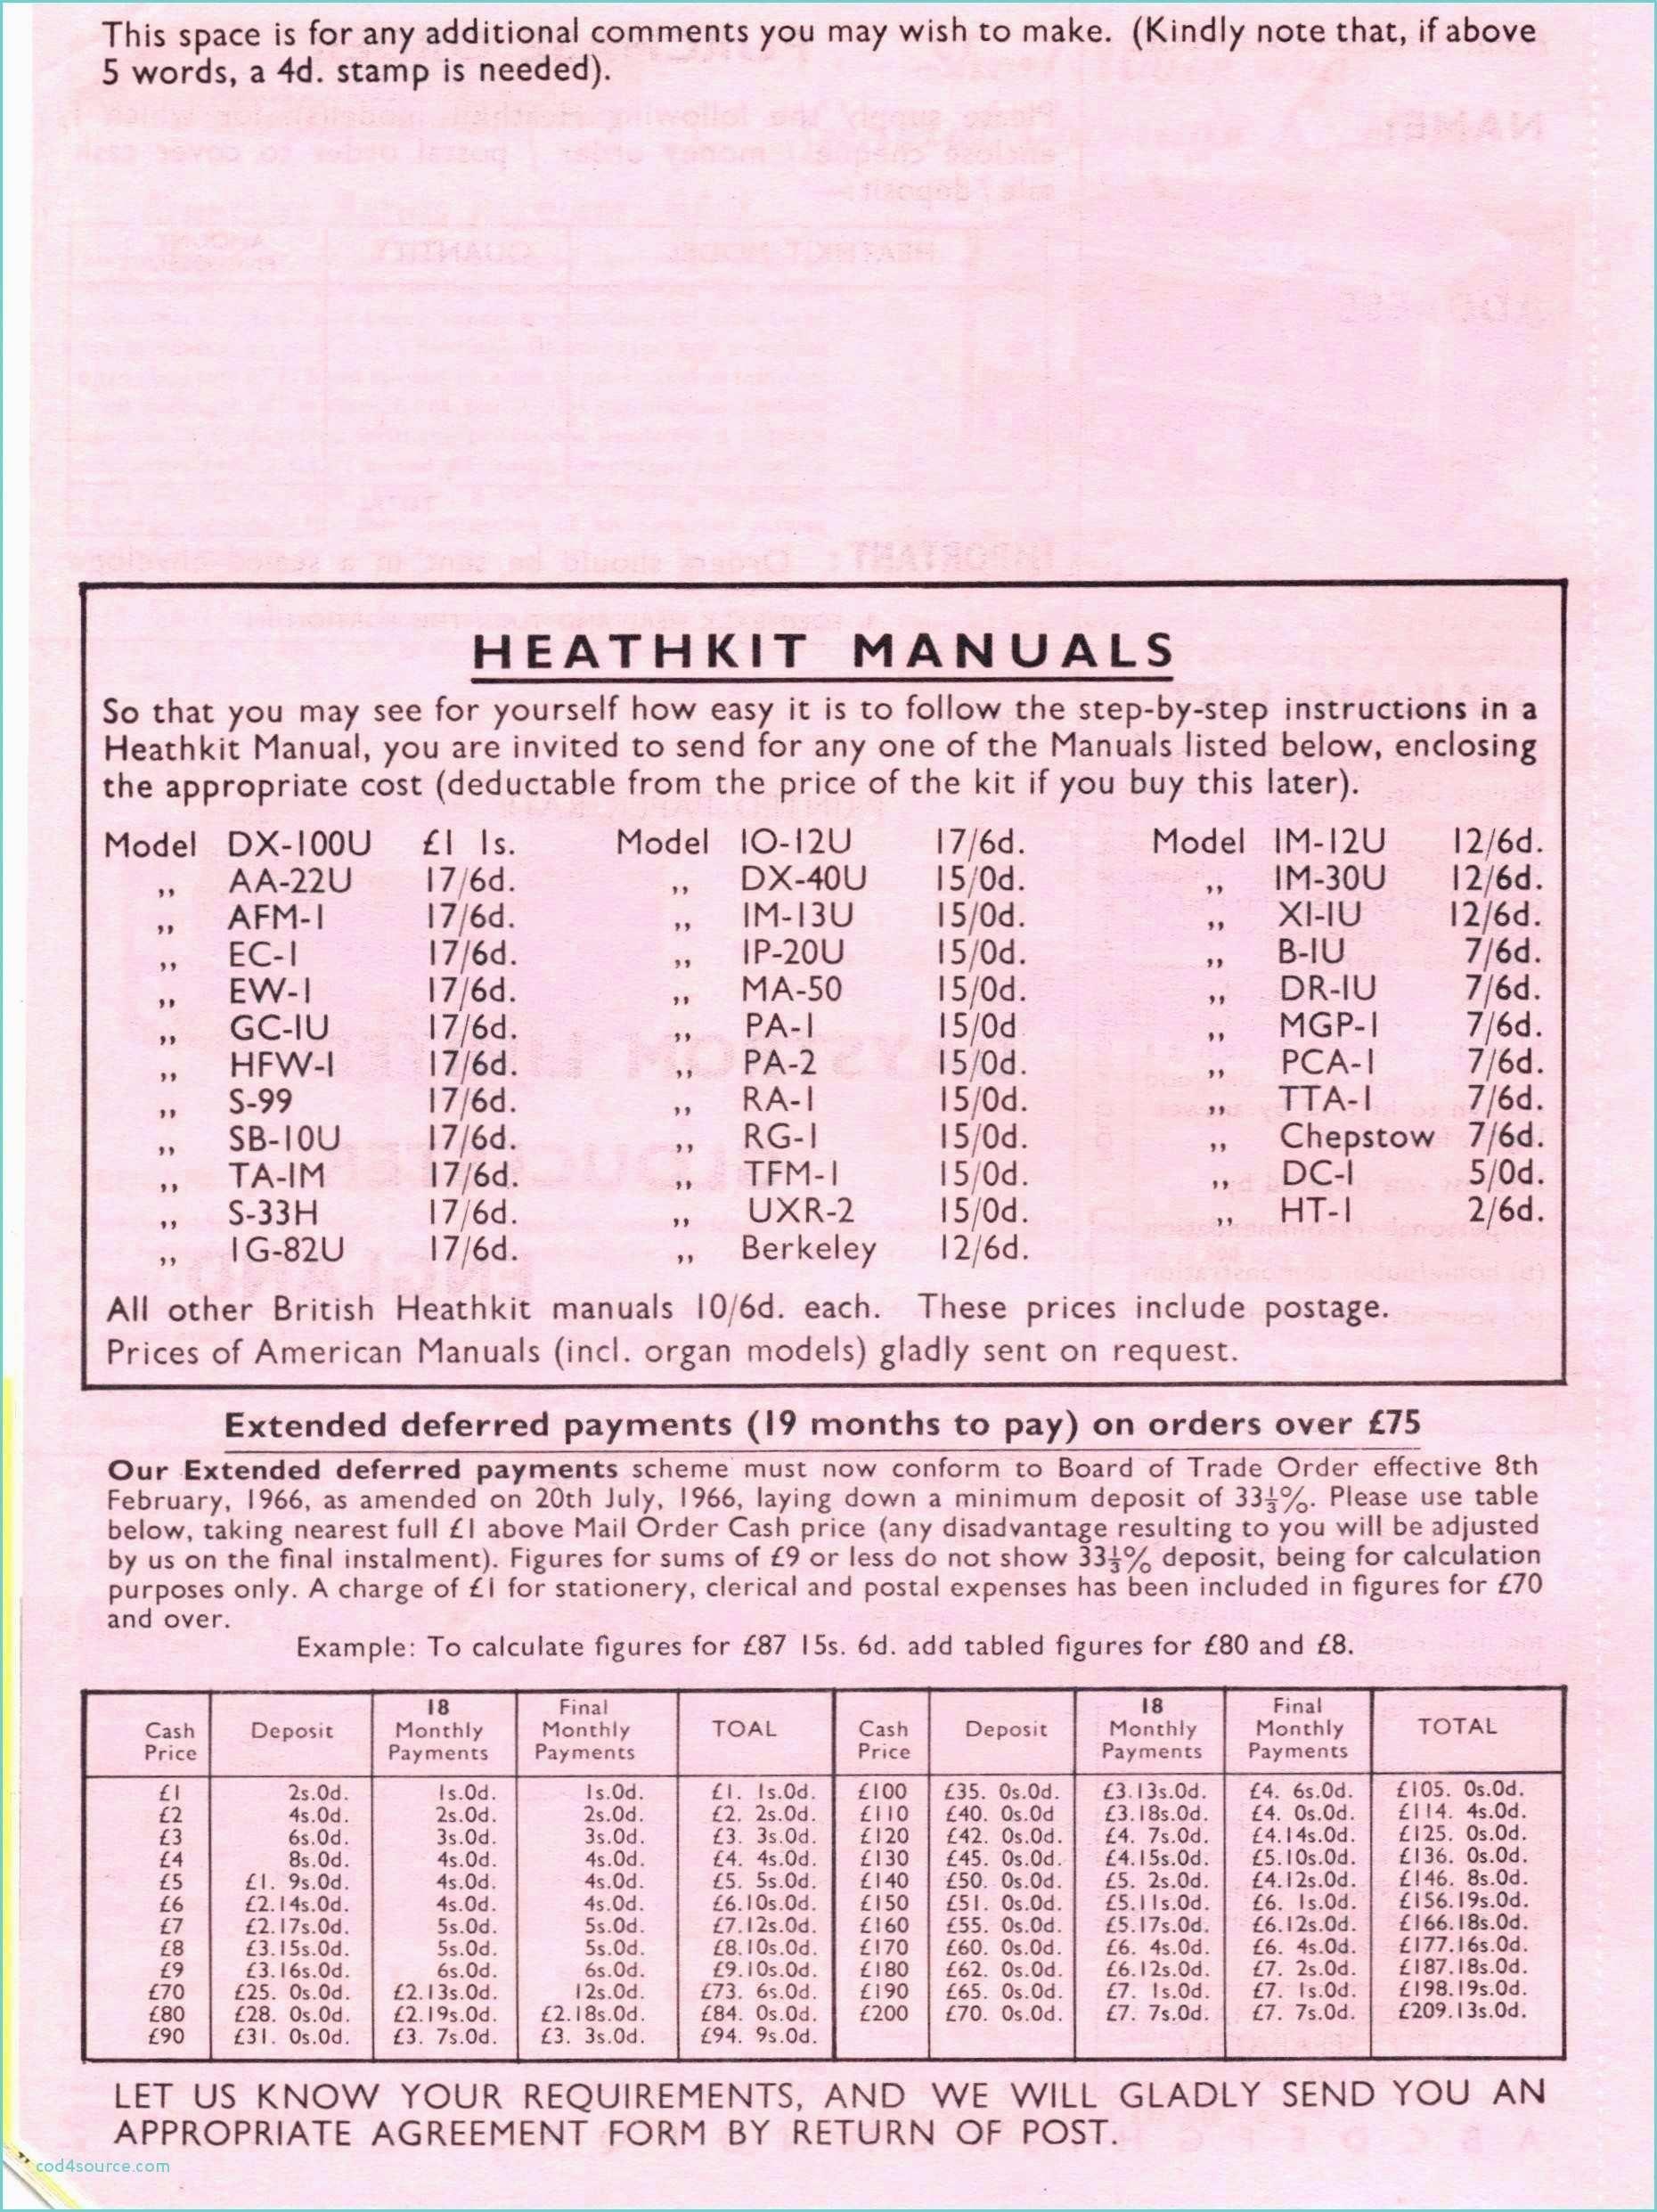 Printable 1099 Form 2015 New ˆš 1099 Div Form 2016 Plan Form 1099 A - Free Printable 1096 Form 2015